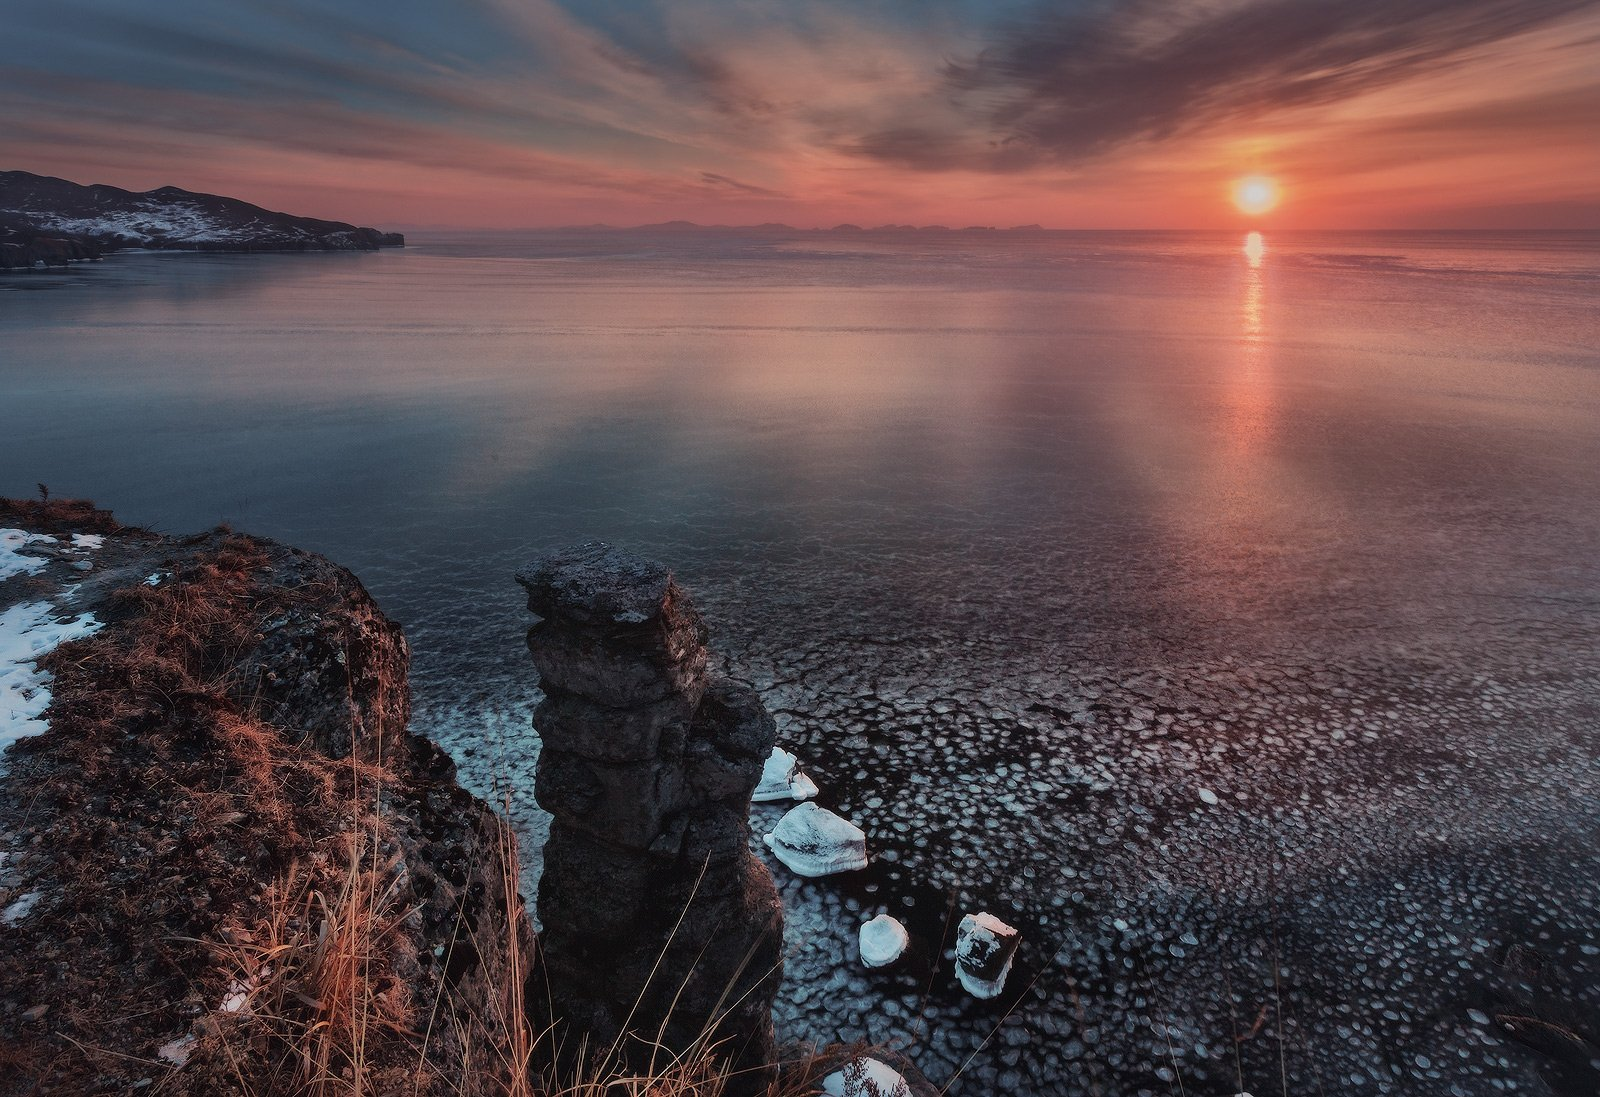 Восход, Зима, Море, Скалы, Солнце, Утро, Андрей Кровлин